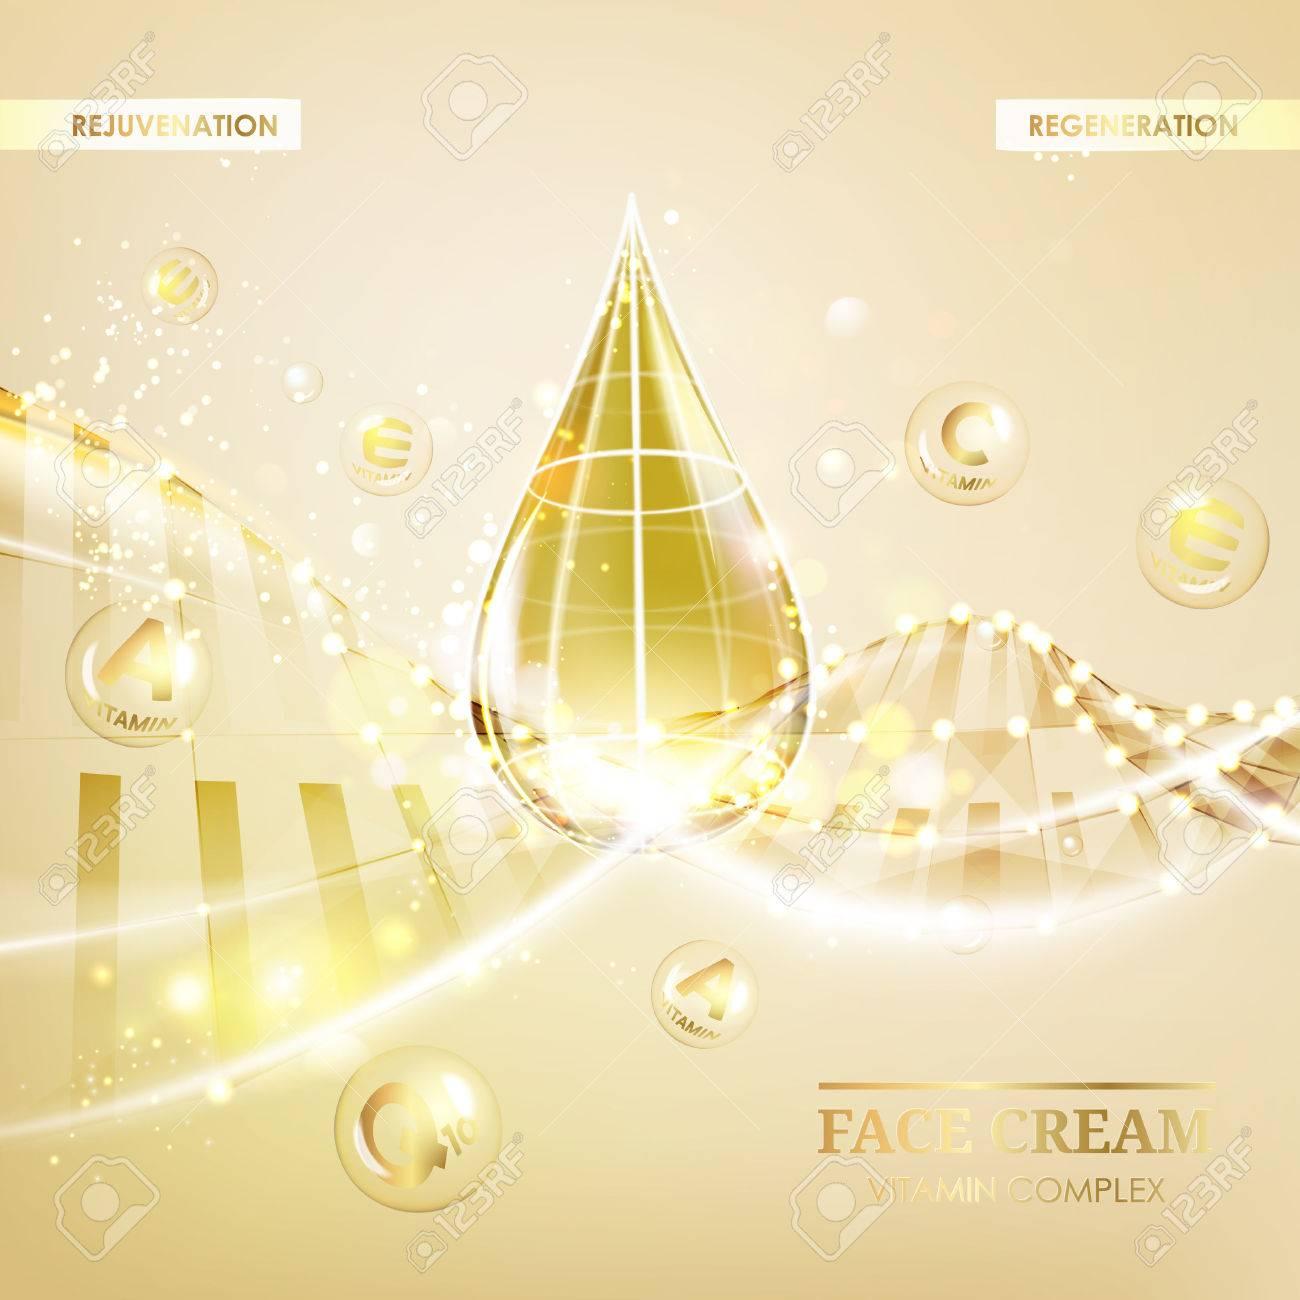 Regenerate face cream and Vitamin complex concept. Shining golden essence droplet. Vitamin E drop in form of sphere. Beauty skin care design over golden backdrop. Vector illustration. - 60175705